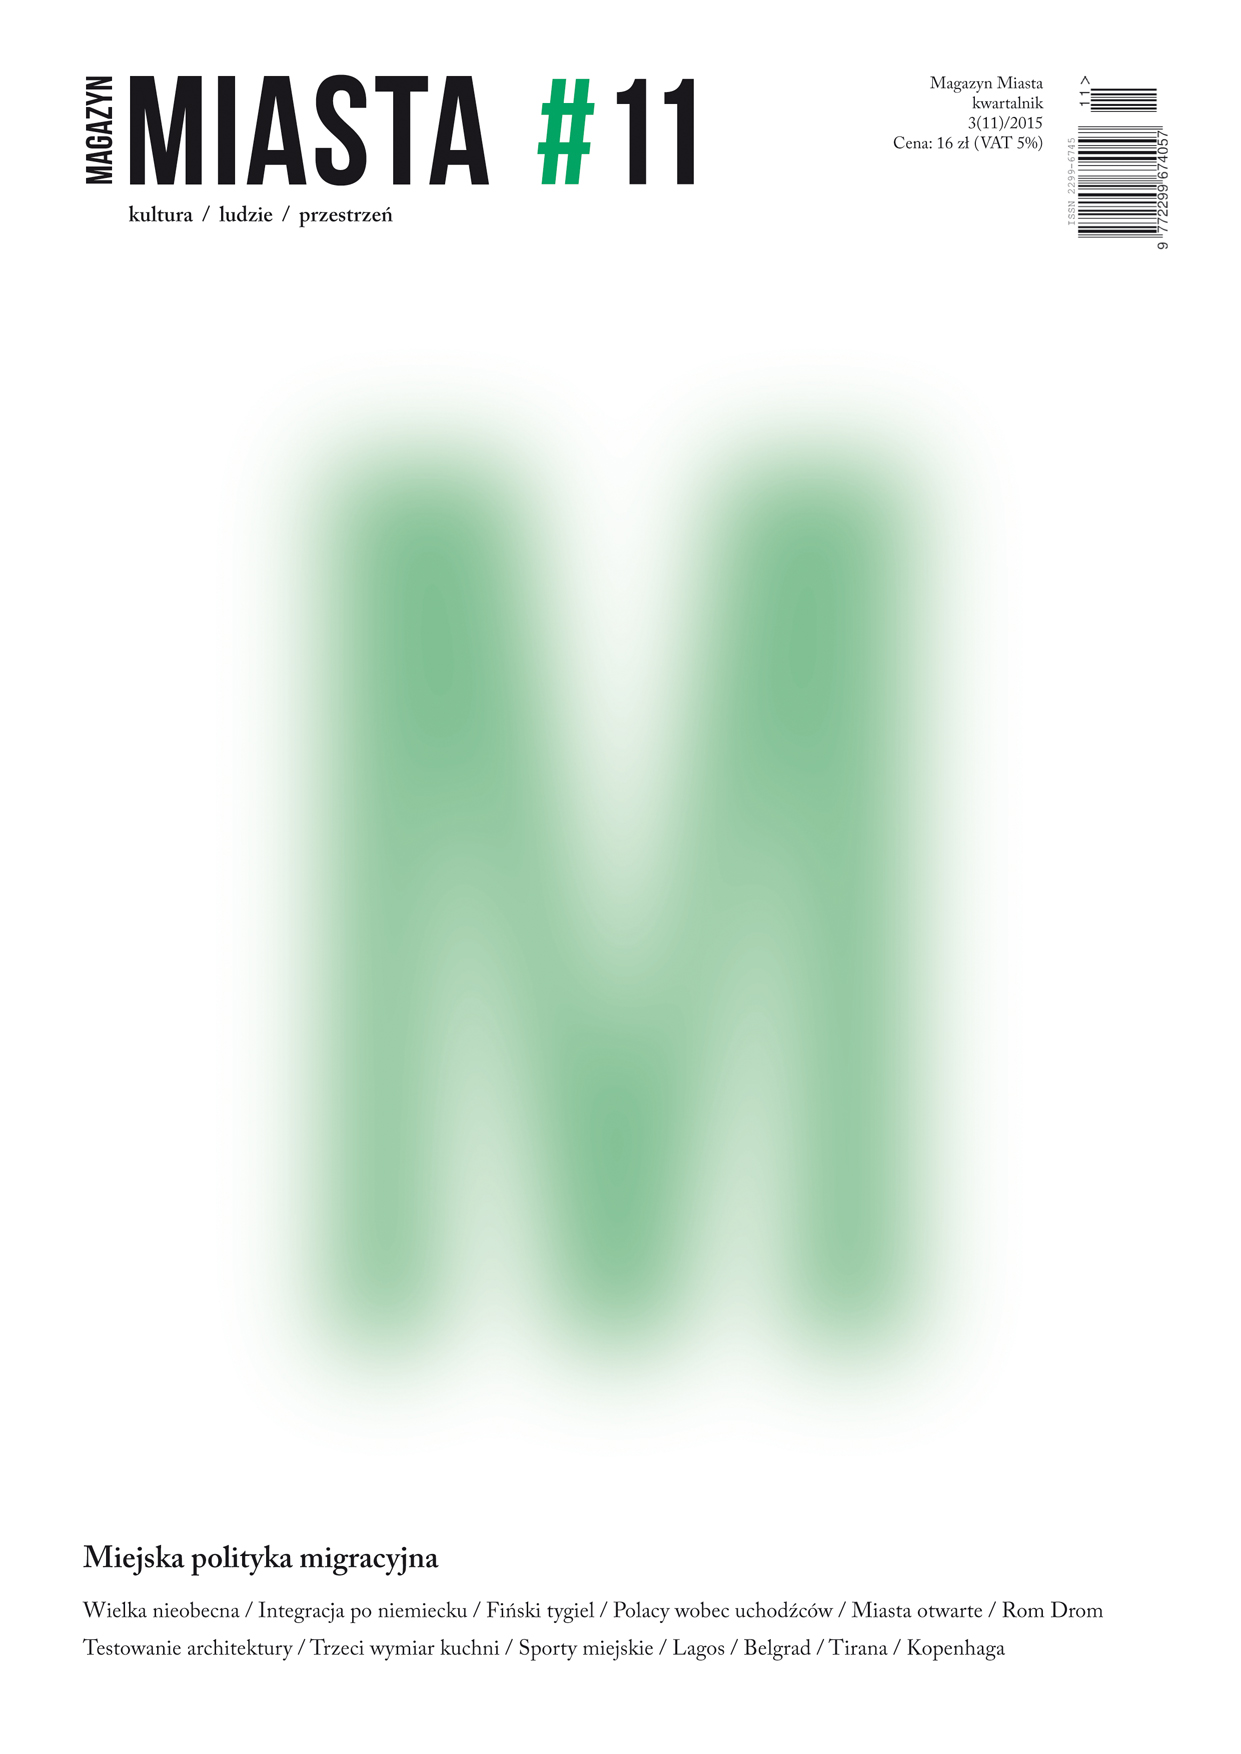 MM #11